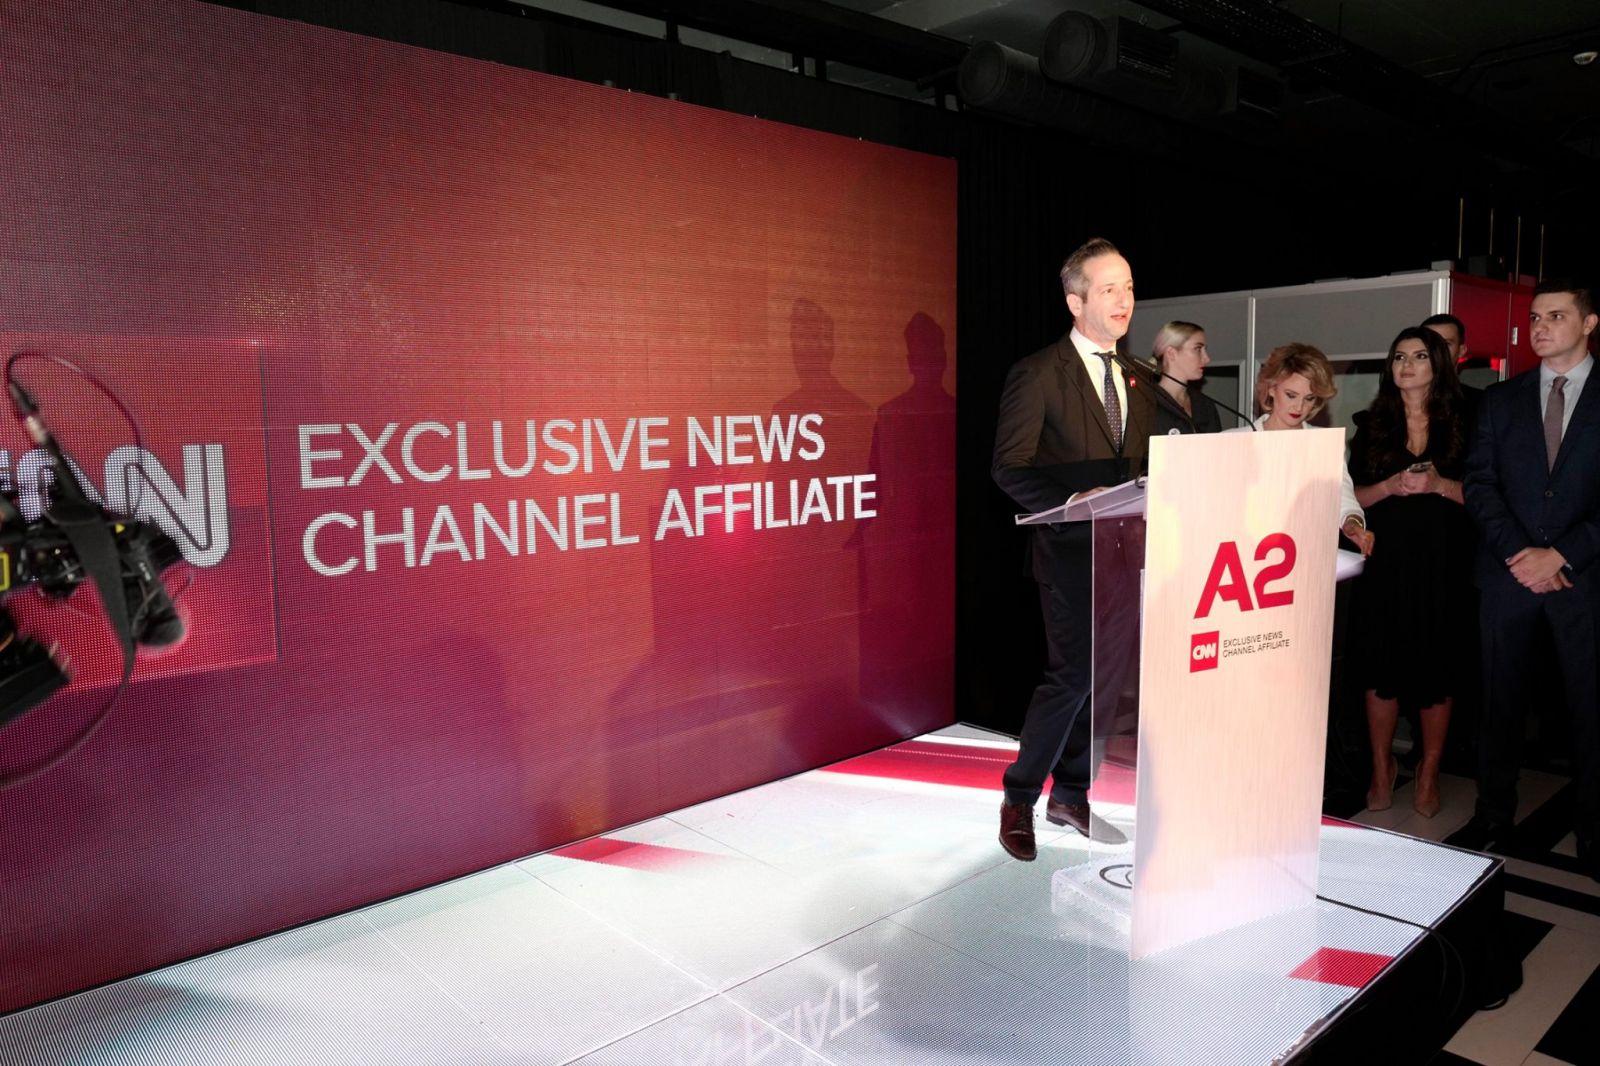 A2 News Launch Event- CNN Representative